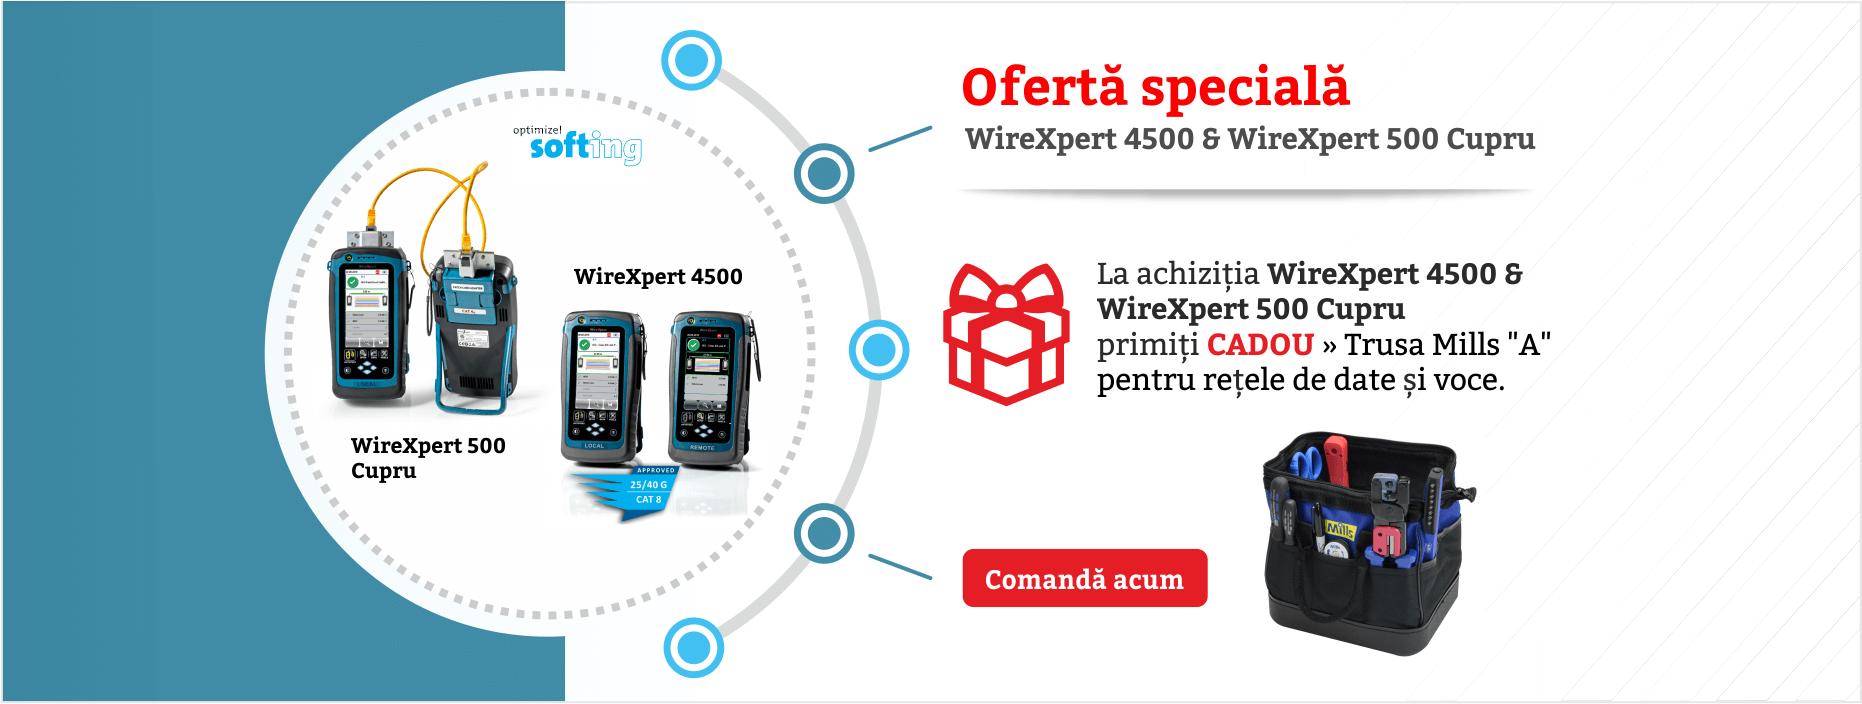 WireXpert 500